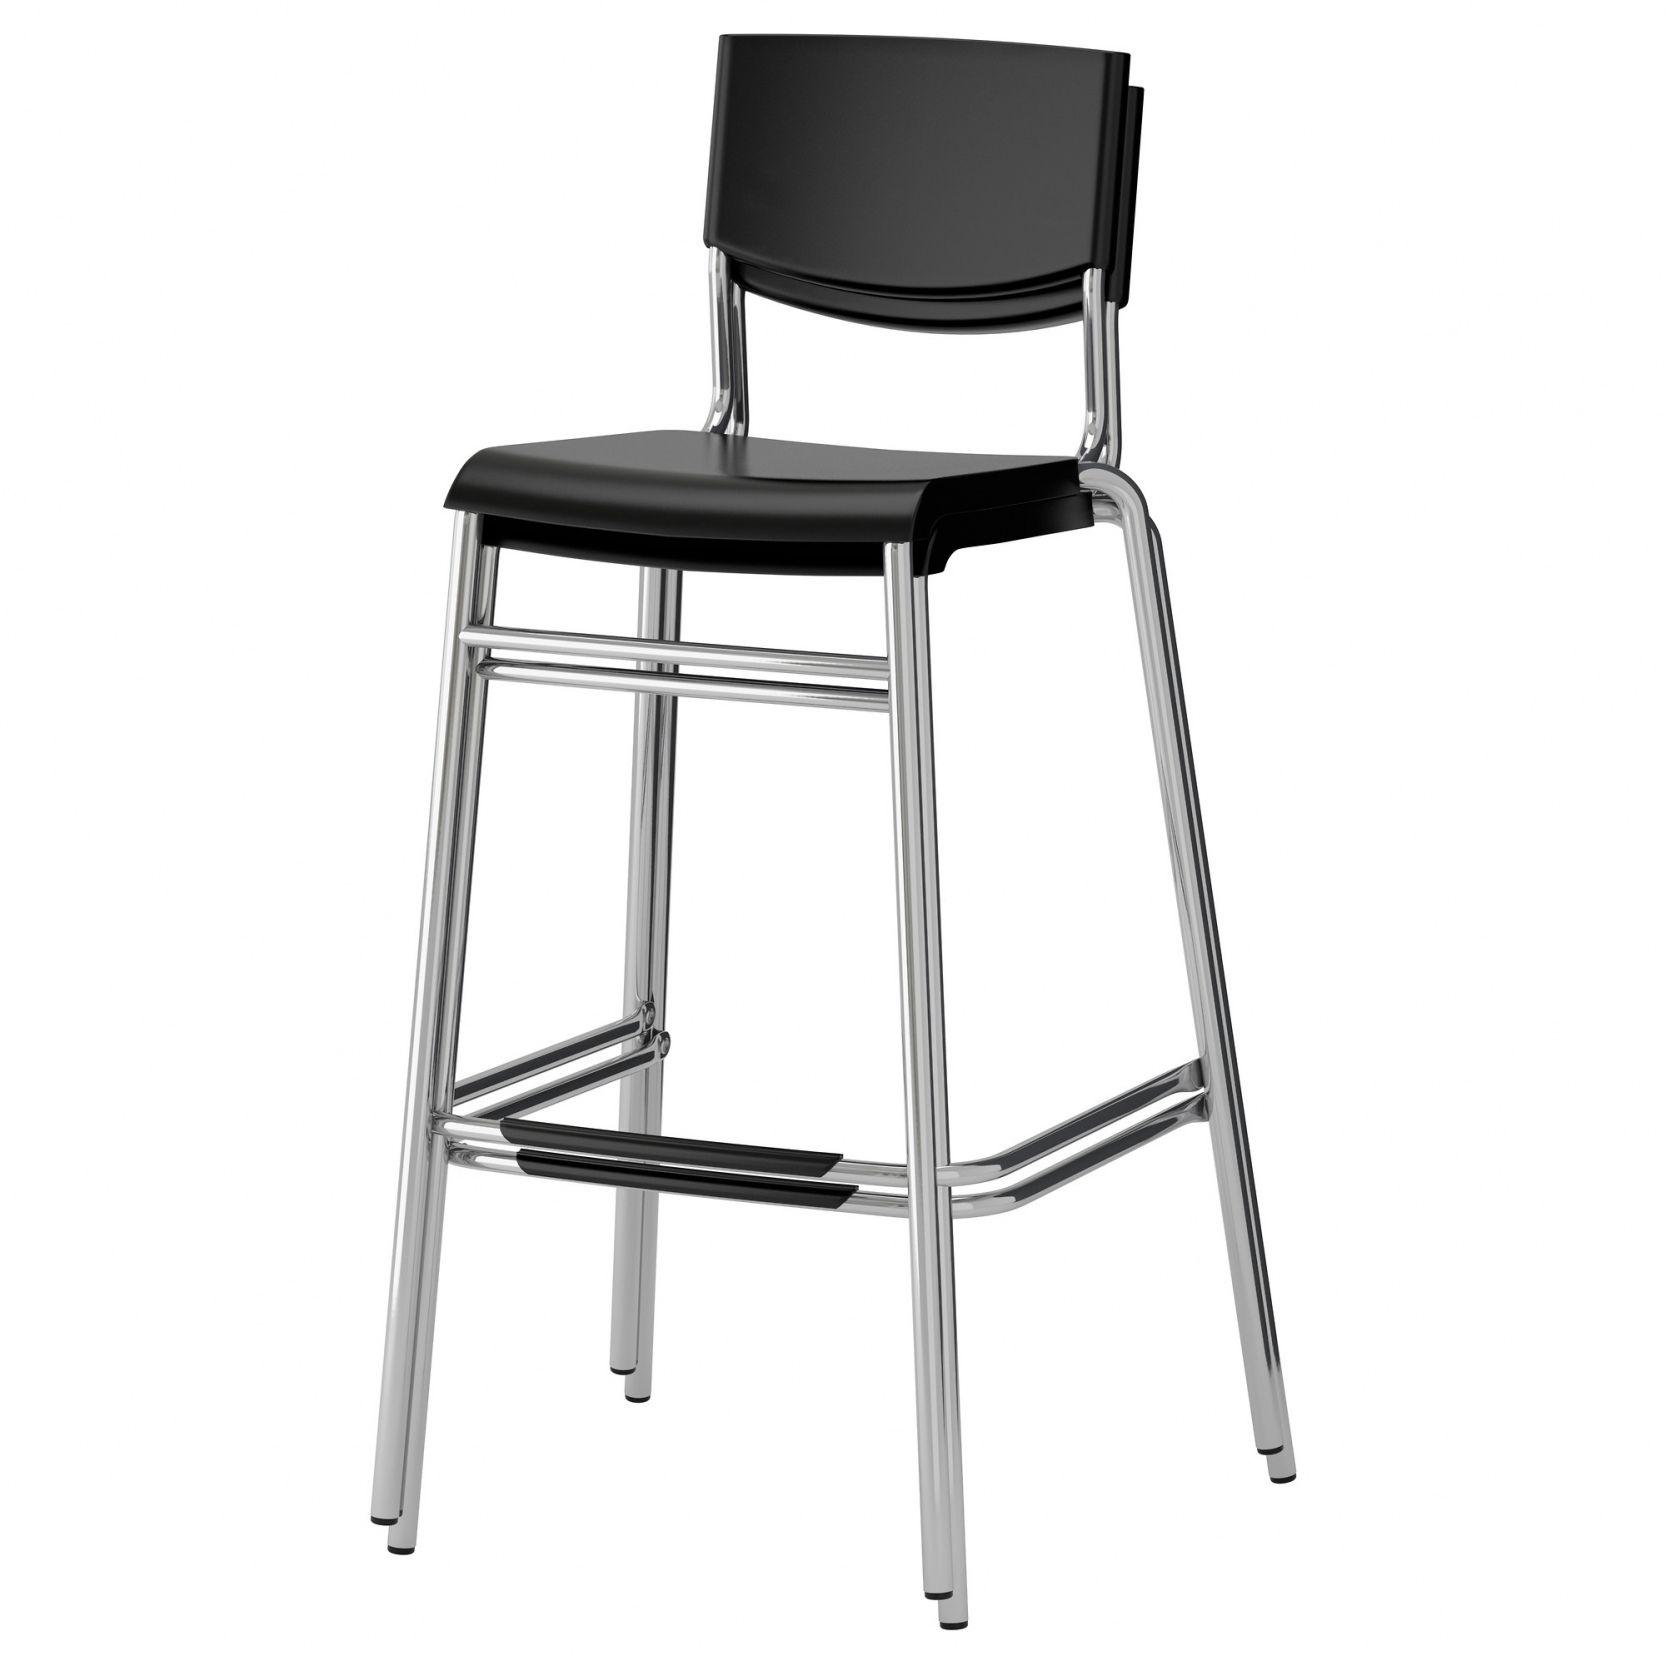 c24dfb79a3224f16408ce05c2084f080 Frais De Bar De Salon Ikea Concept